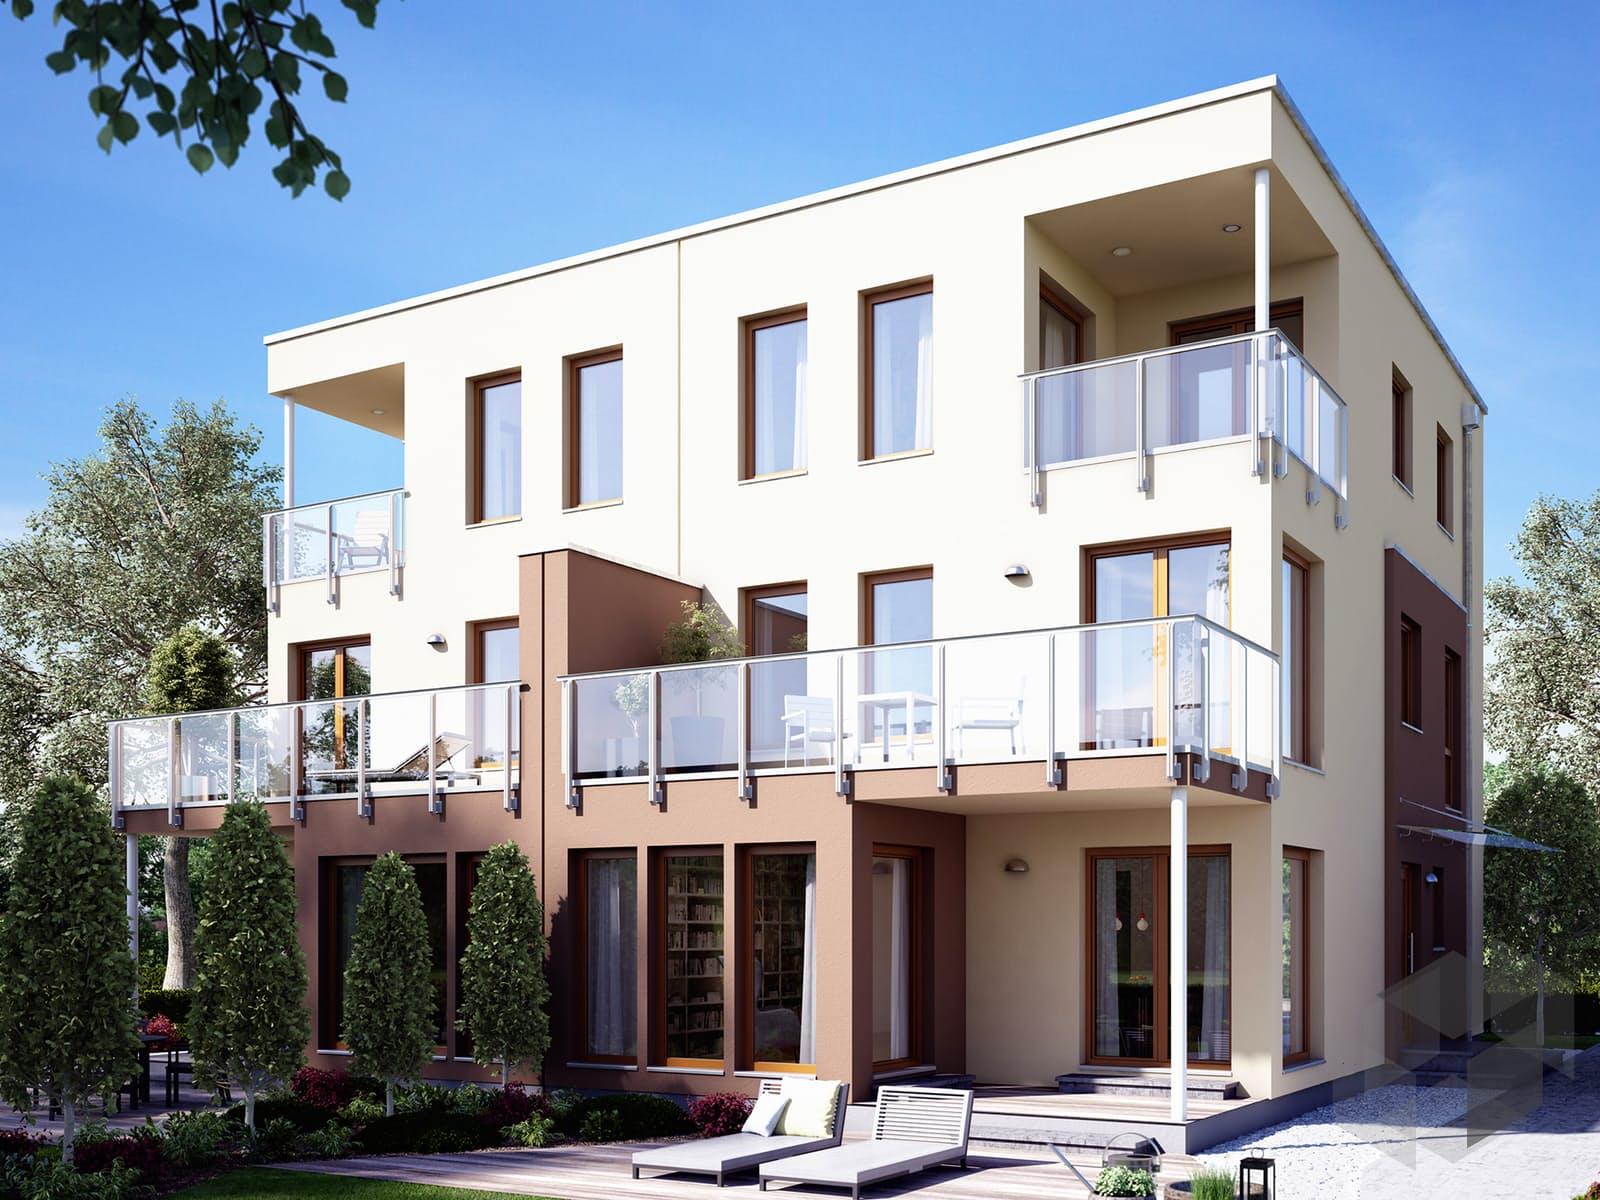 solution 126 xl v6 von living haus komplette daten bersicht. Black Bedroom Furniture Sets. Home Design Ideas